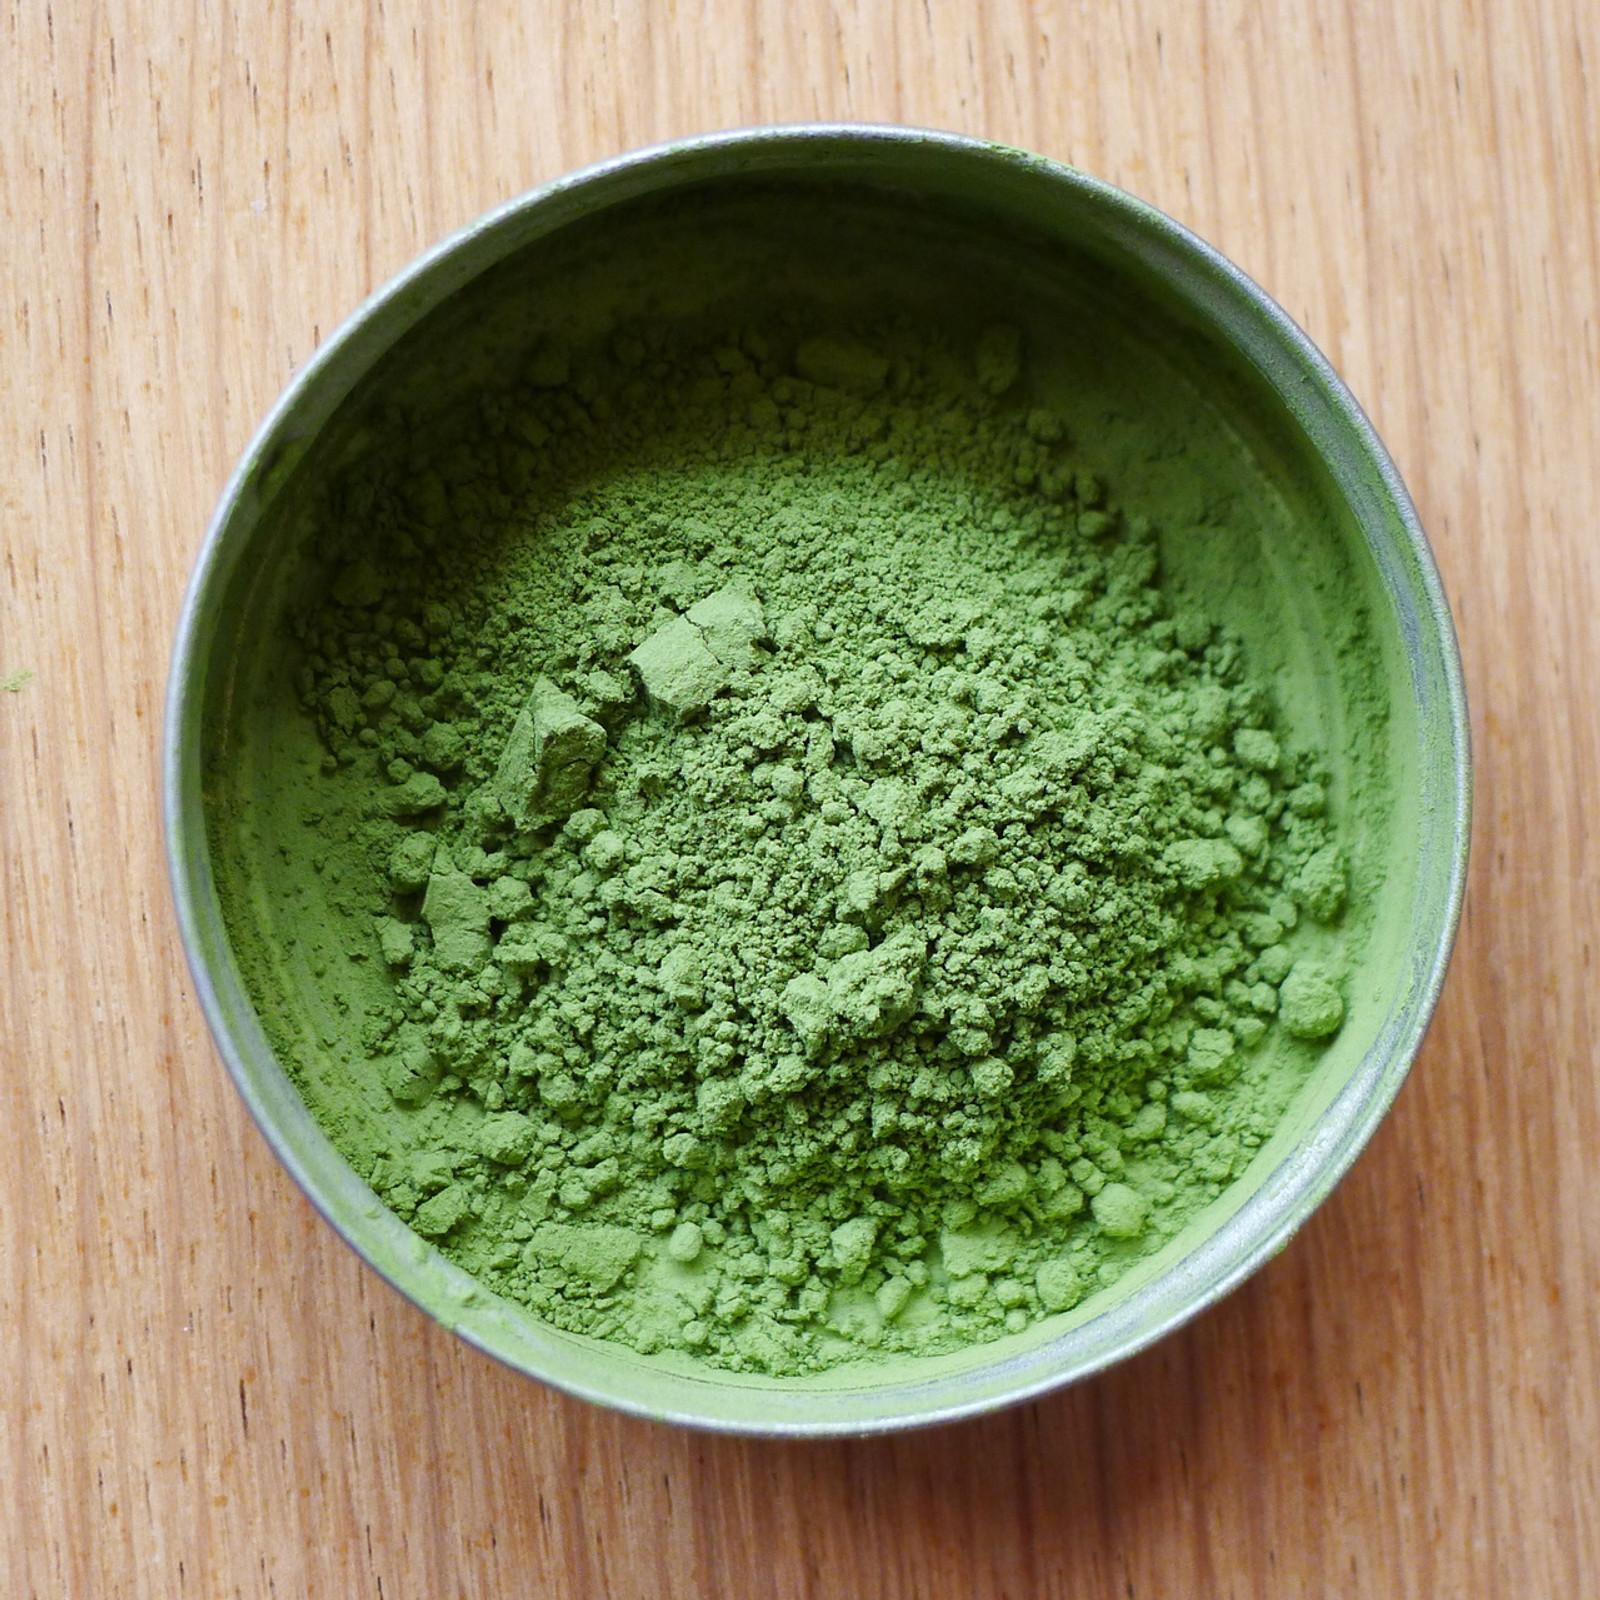 Pure Matcha green tea powder, full of chlorophyl and beneficial amino acids